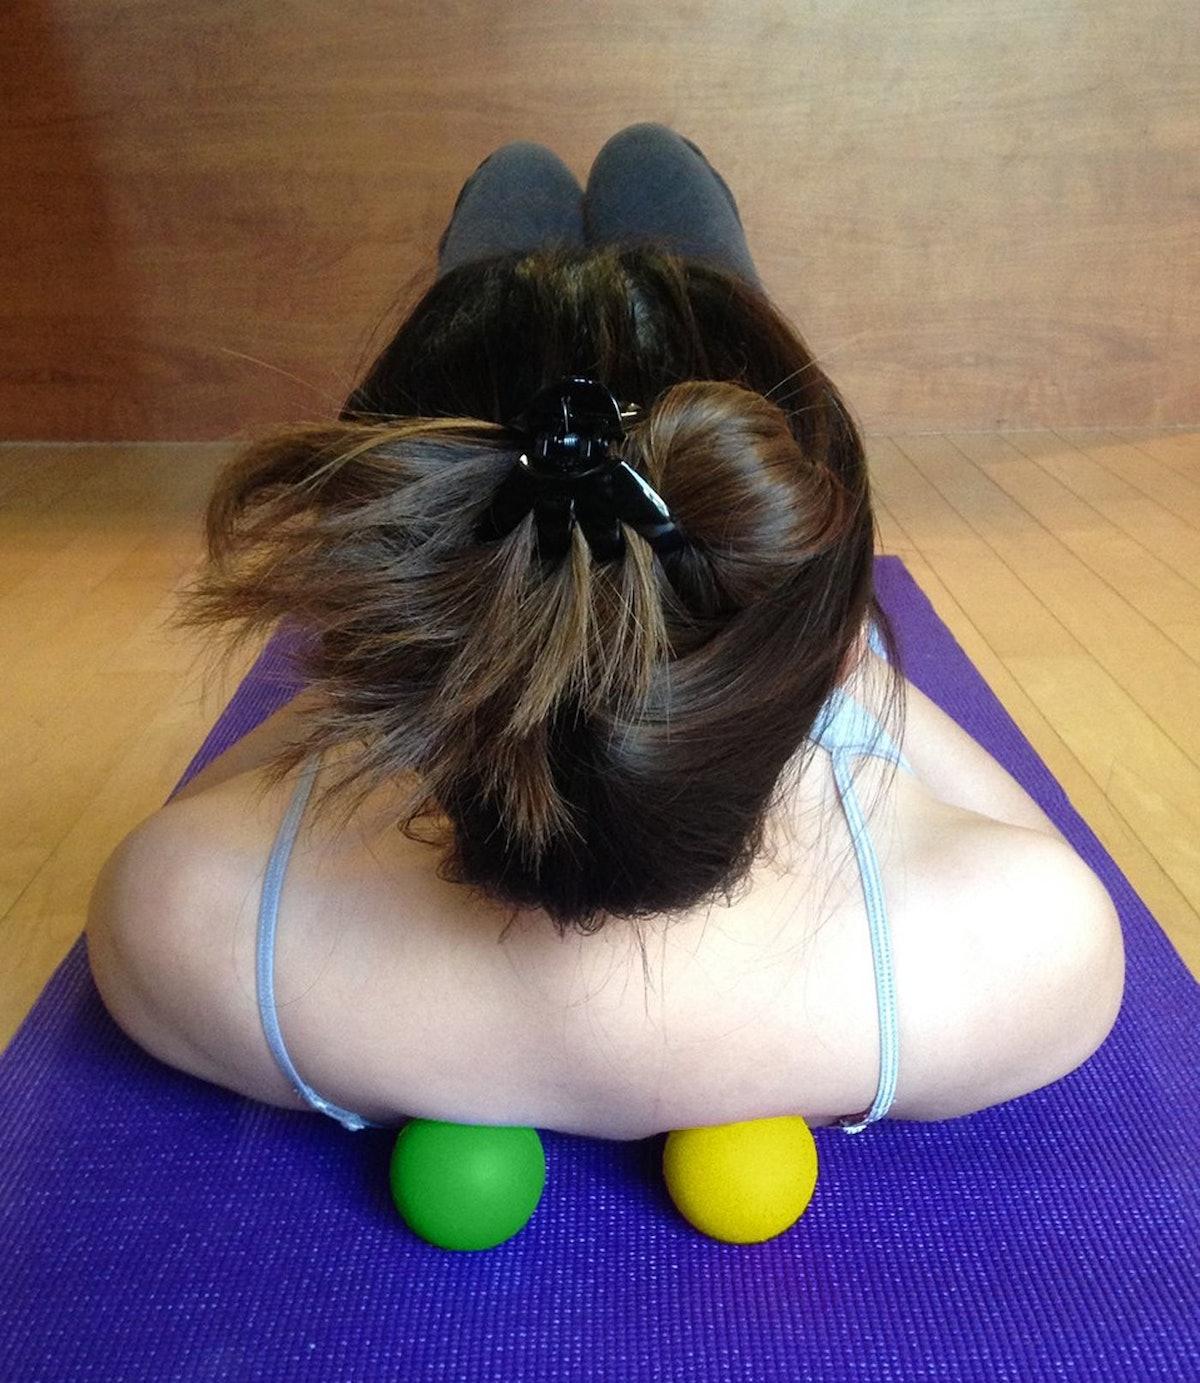 Kieba Massage Balls (2 Pack)